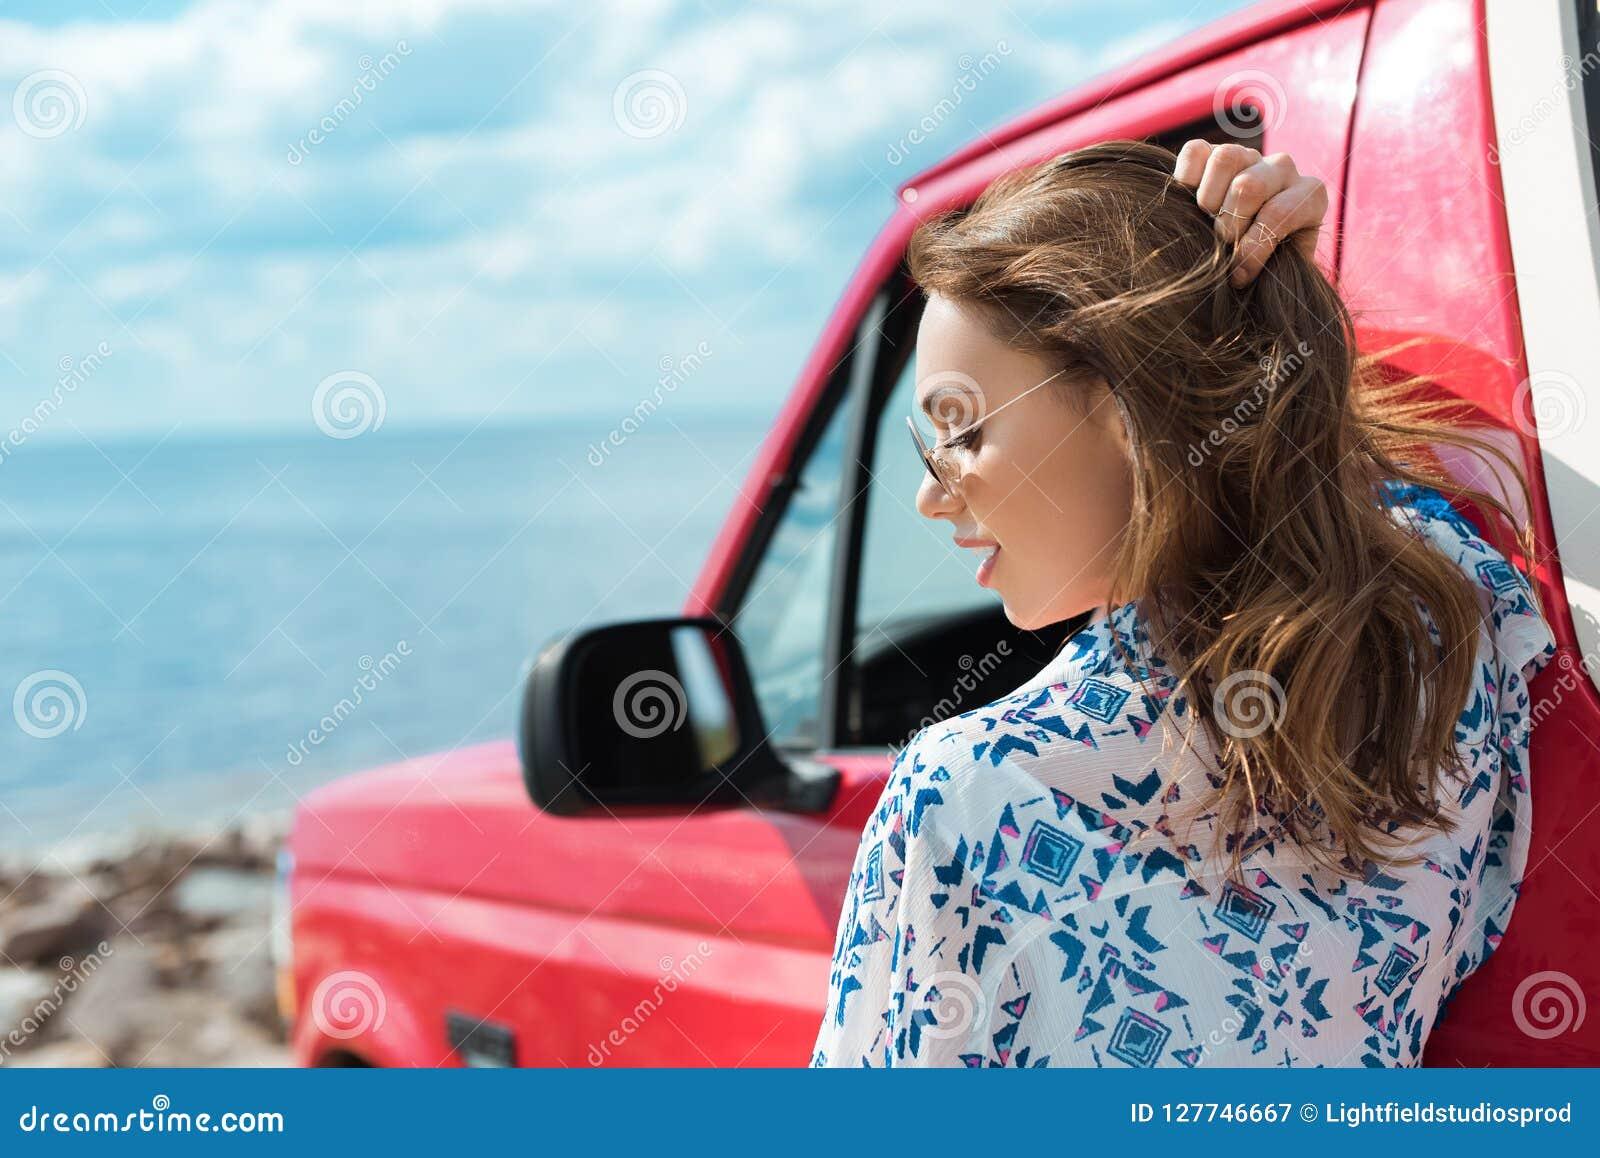 beautiful stylish woman at car during road trip